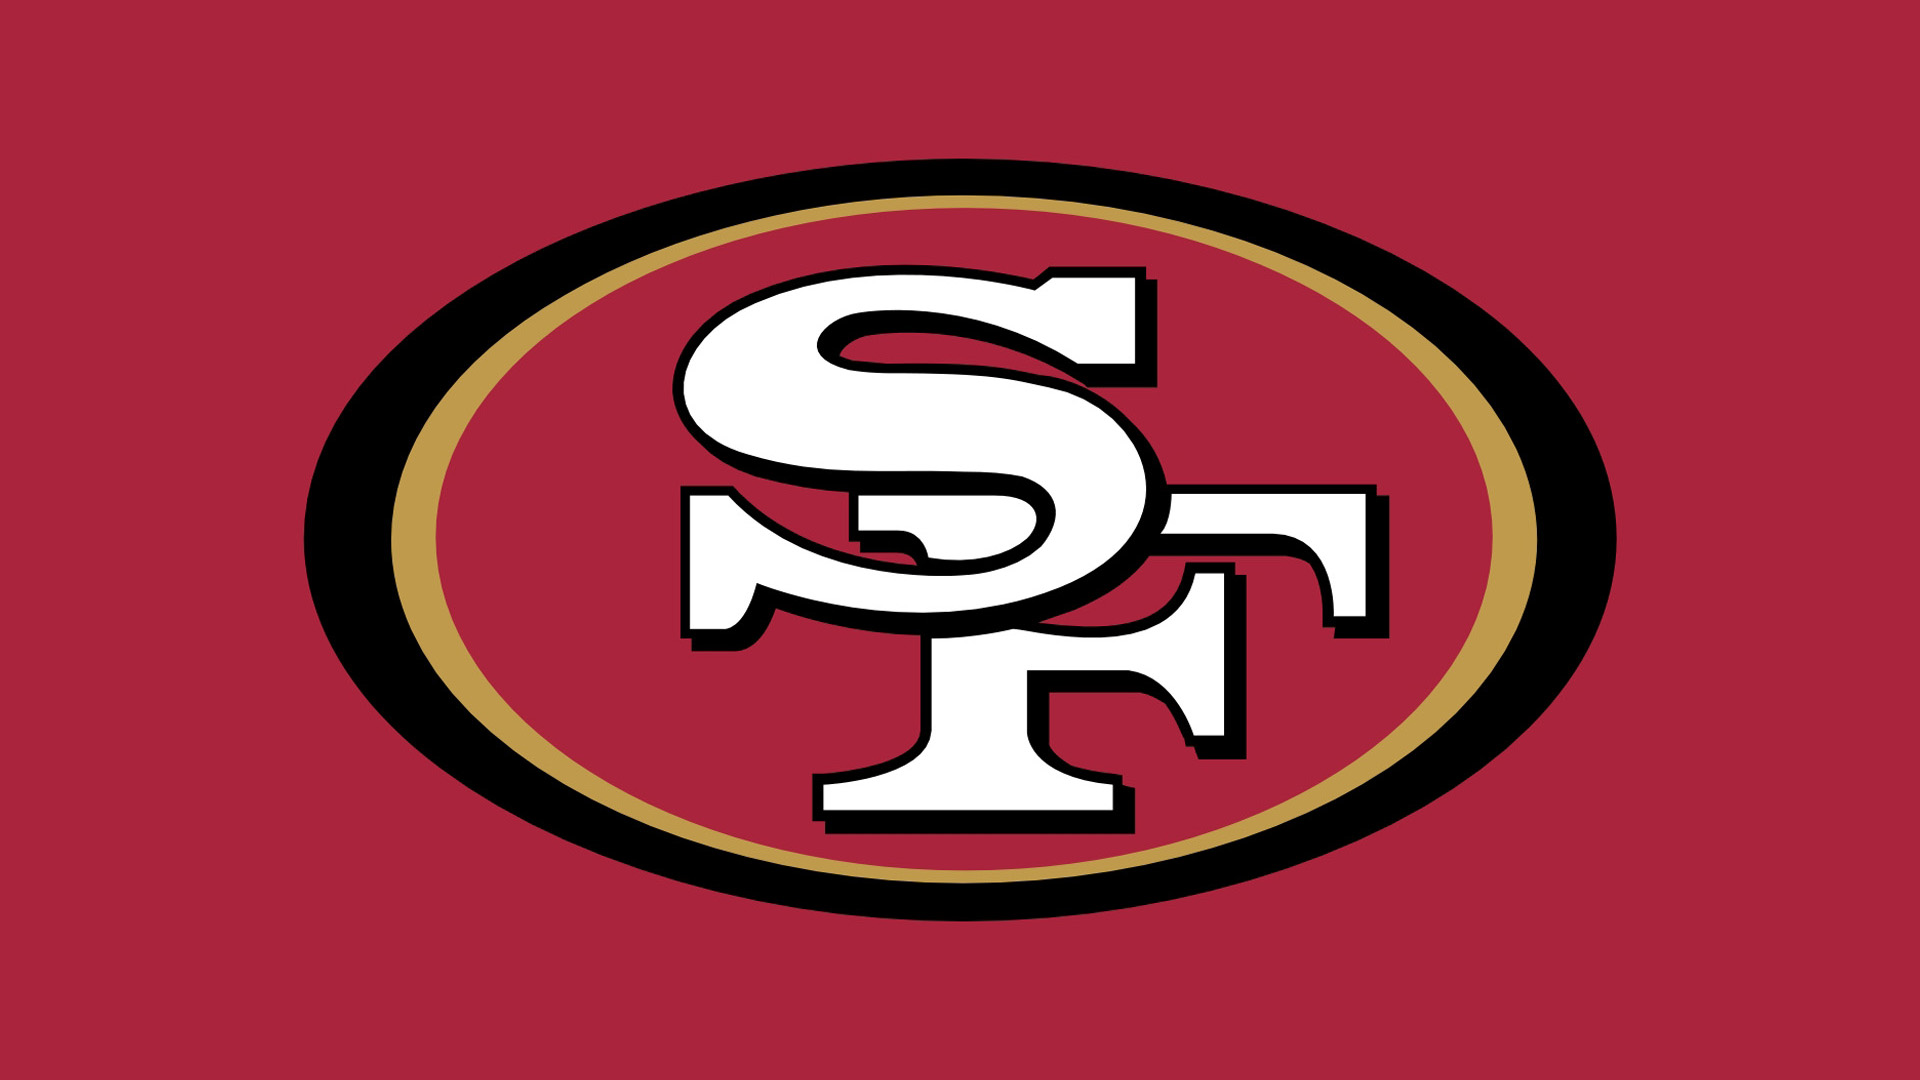 Rumores de la NFL: ¿Richard Sherman a San Francisco 49ers?